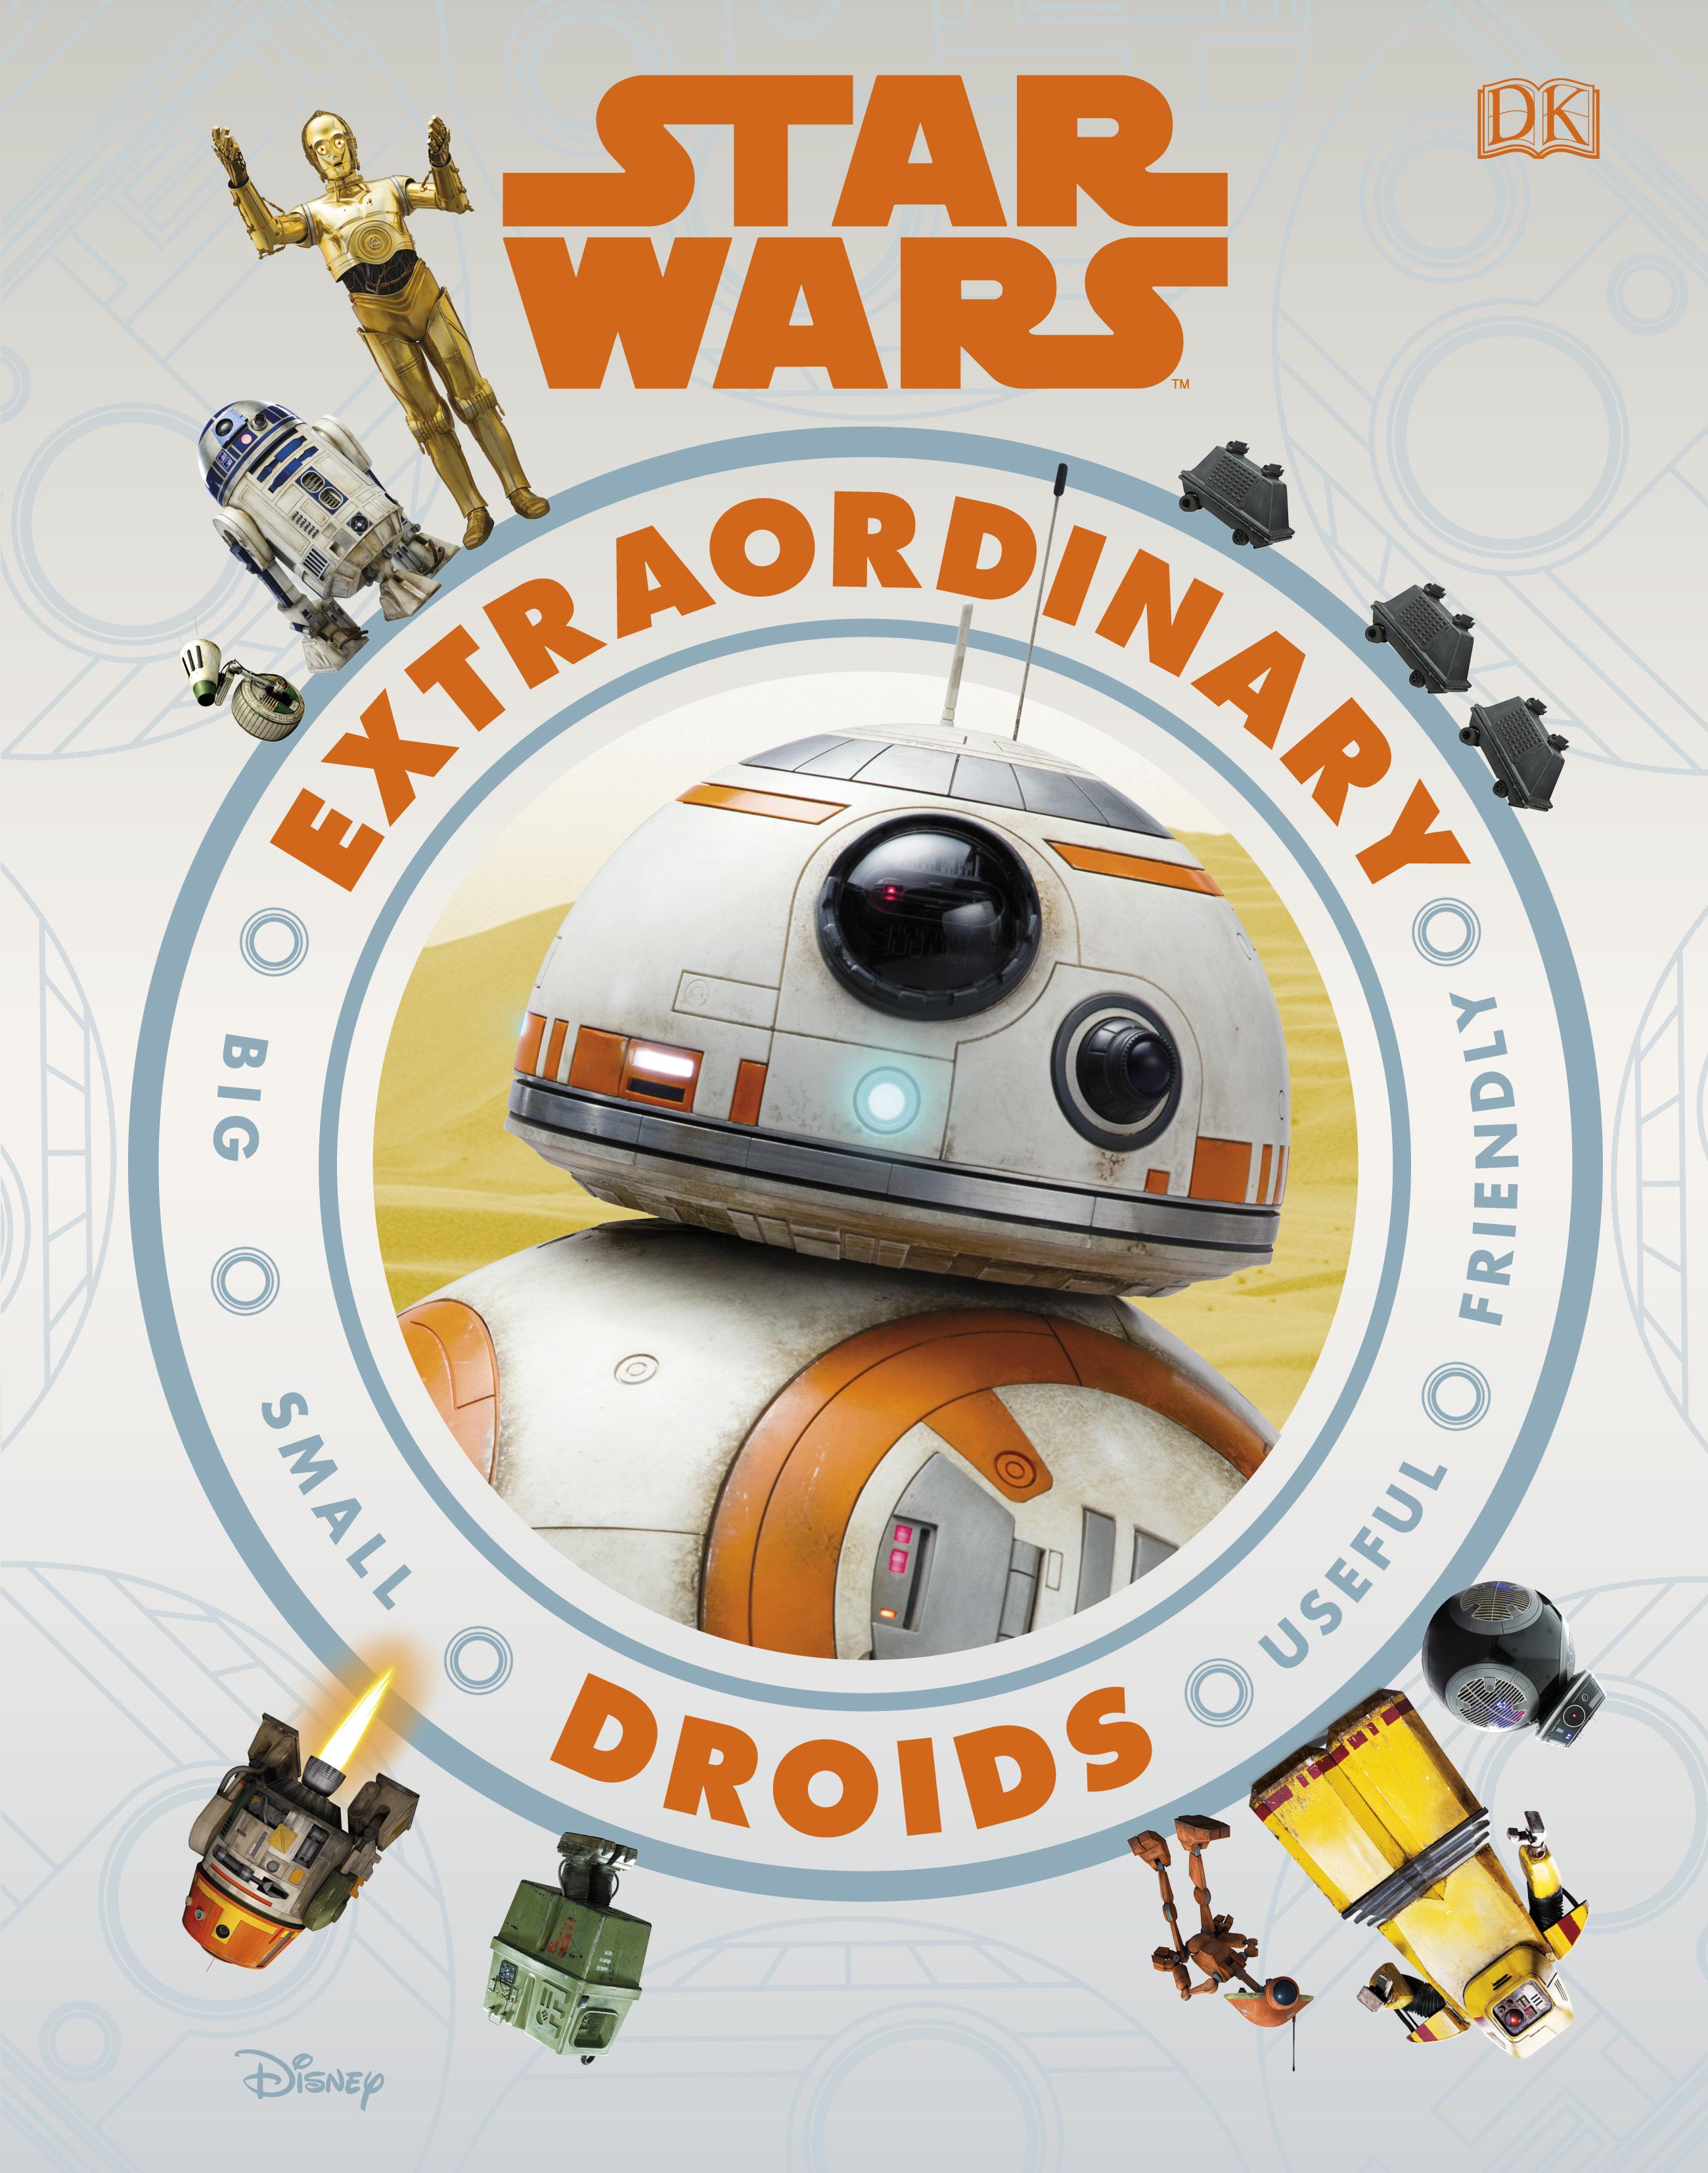 Extraordinary Droids (07.04.2020)